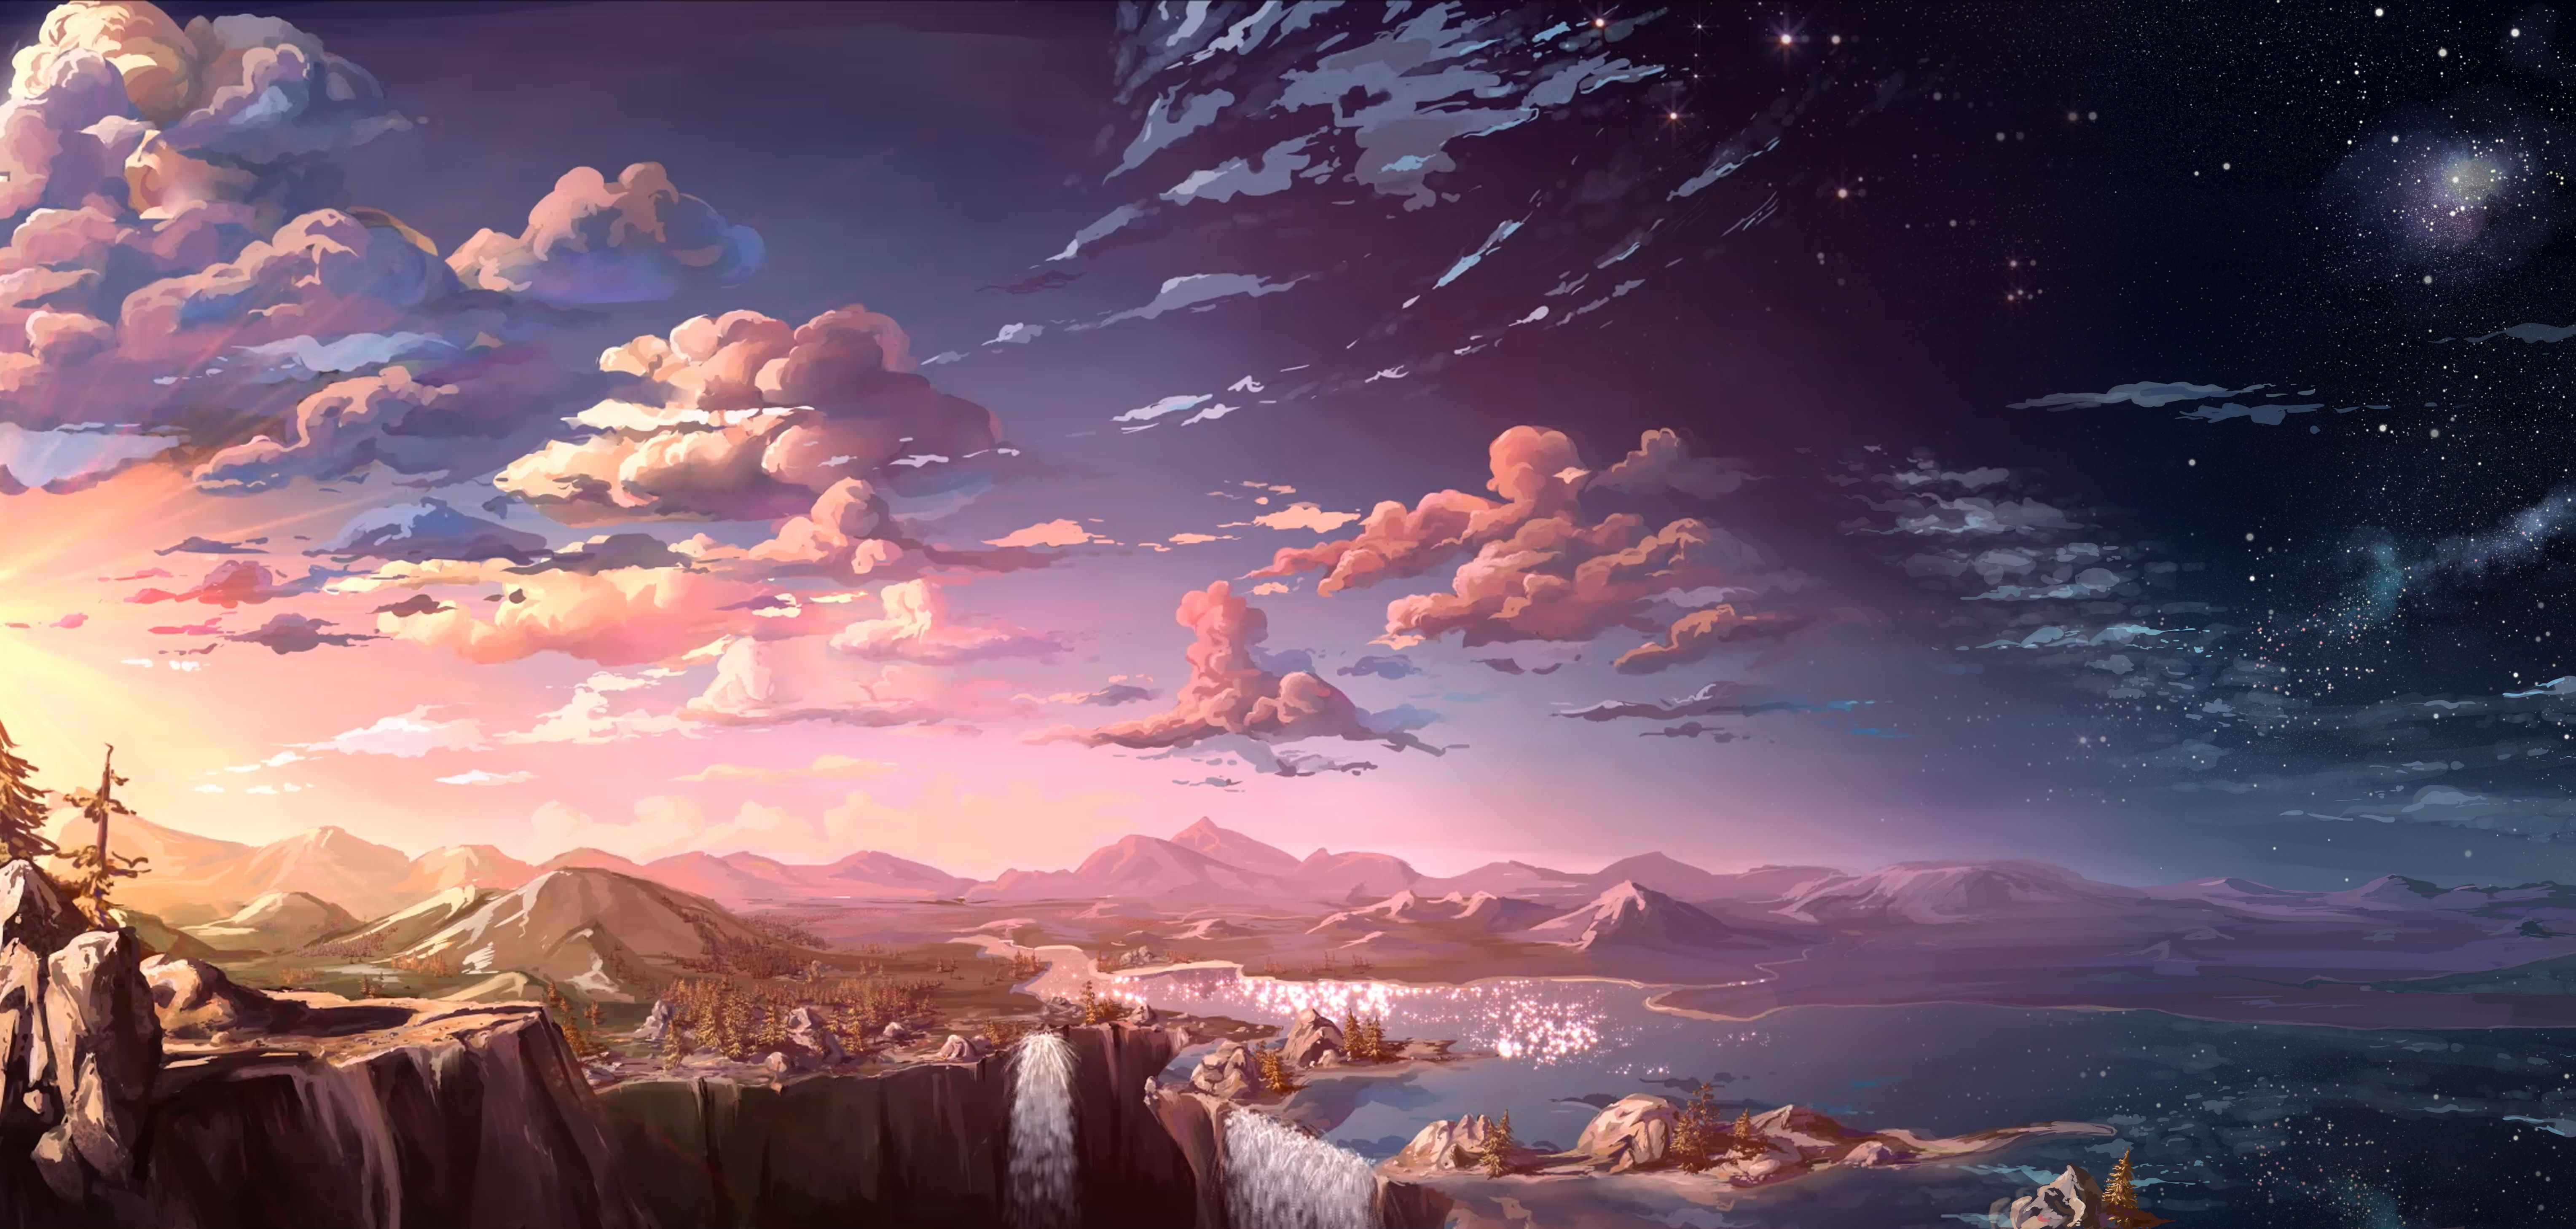 Anime landscapes google search anime anime scenery - Anime scenery wallpaper laptop ...